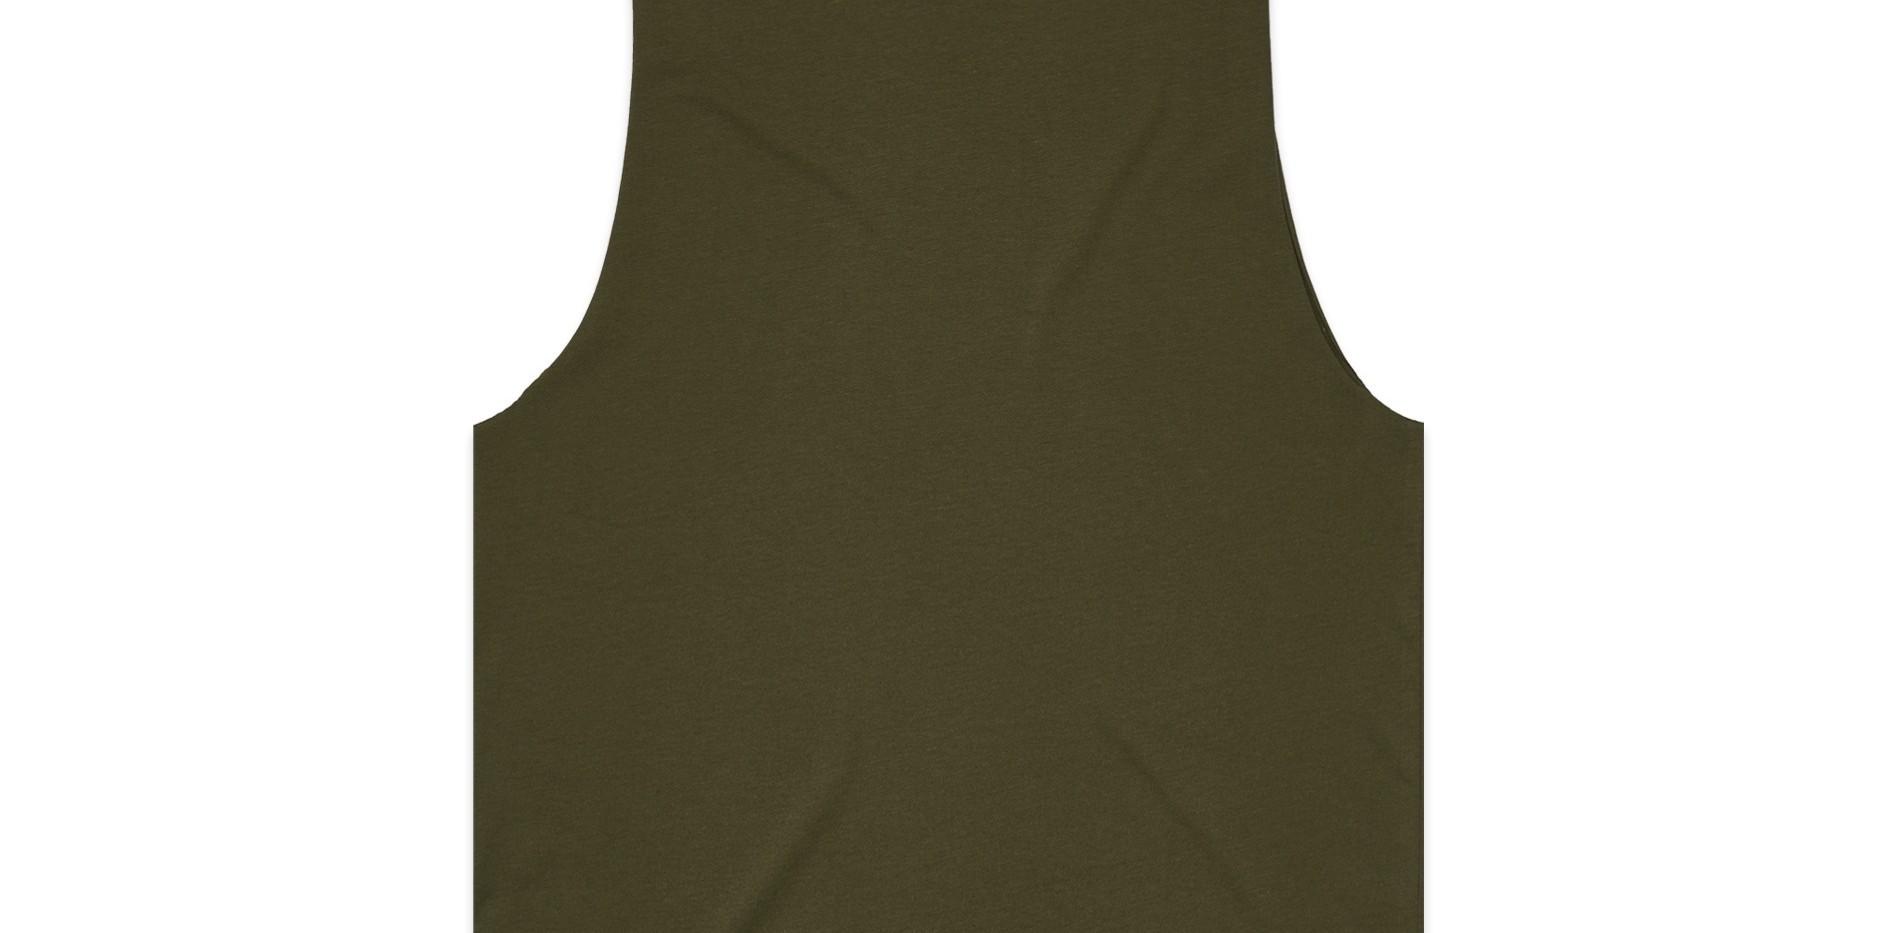 5025_barnard_tank_army_1.jpg